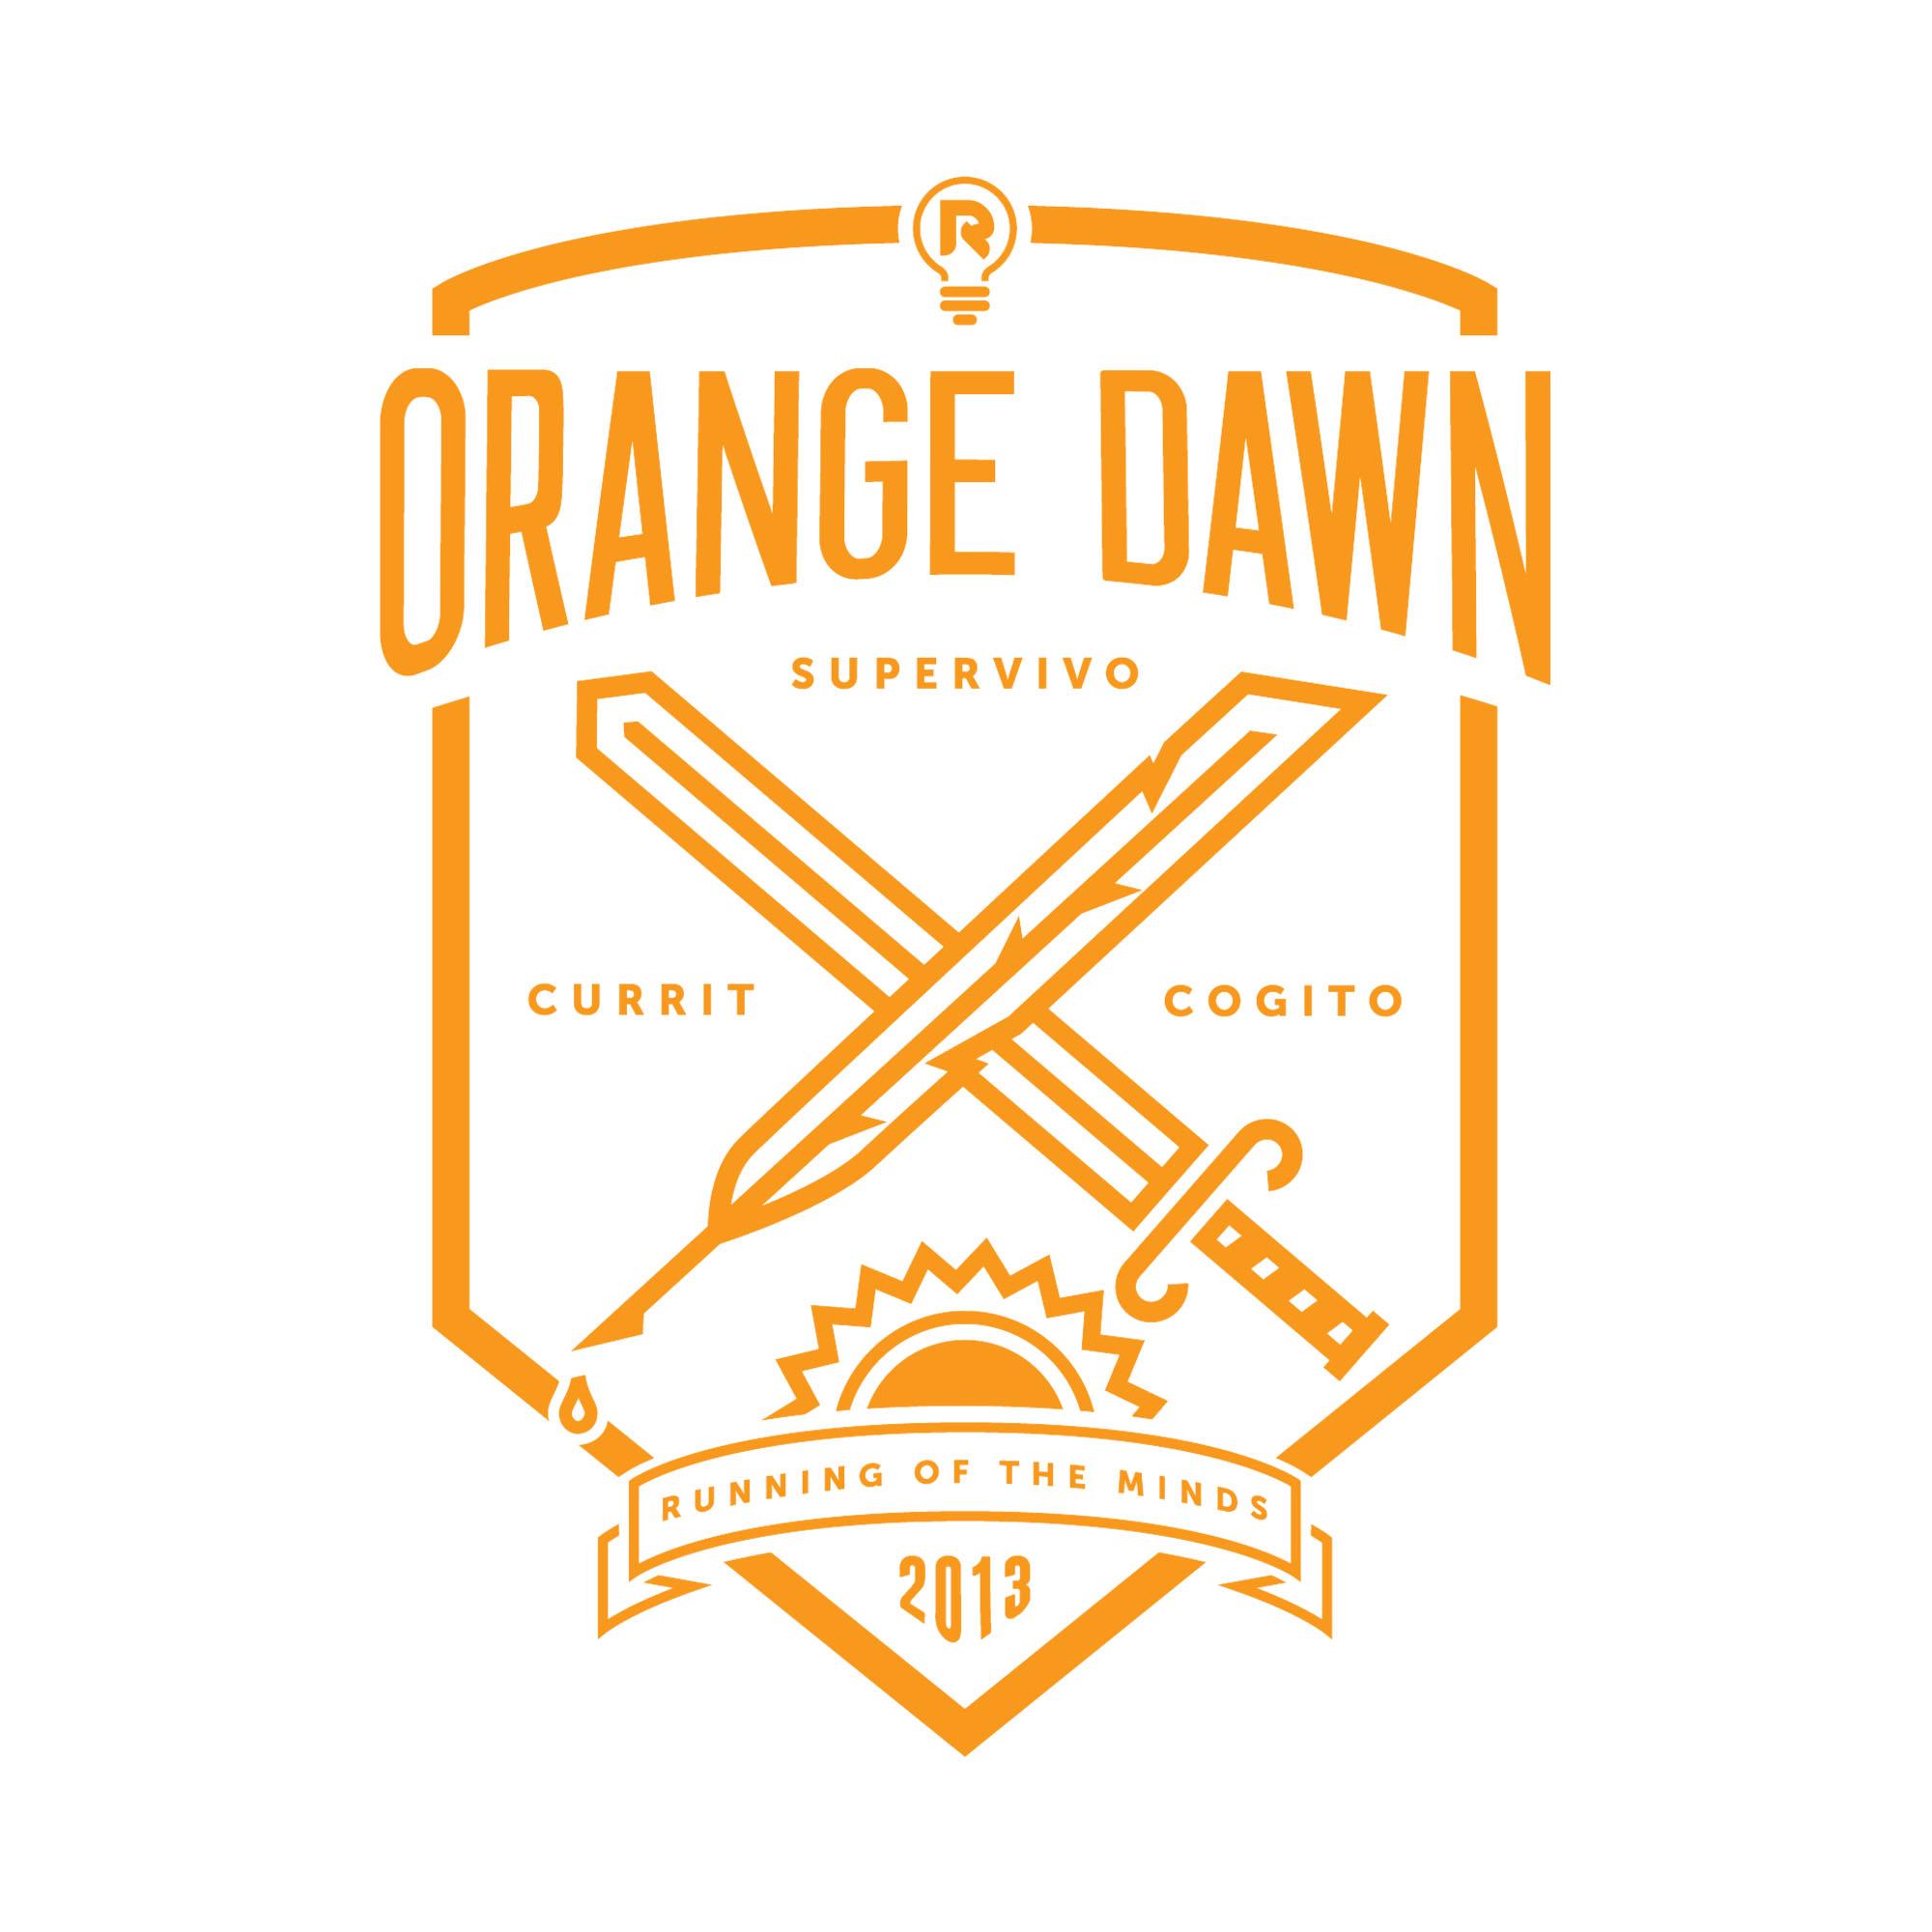 orangedawn_001